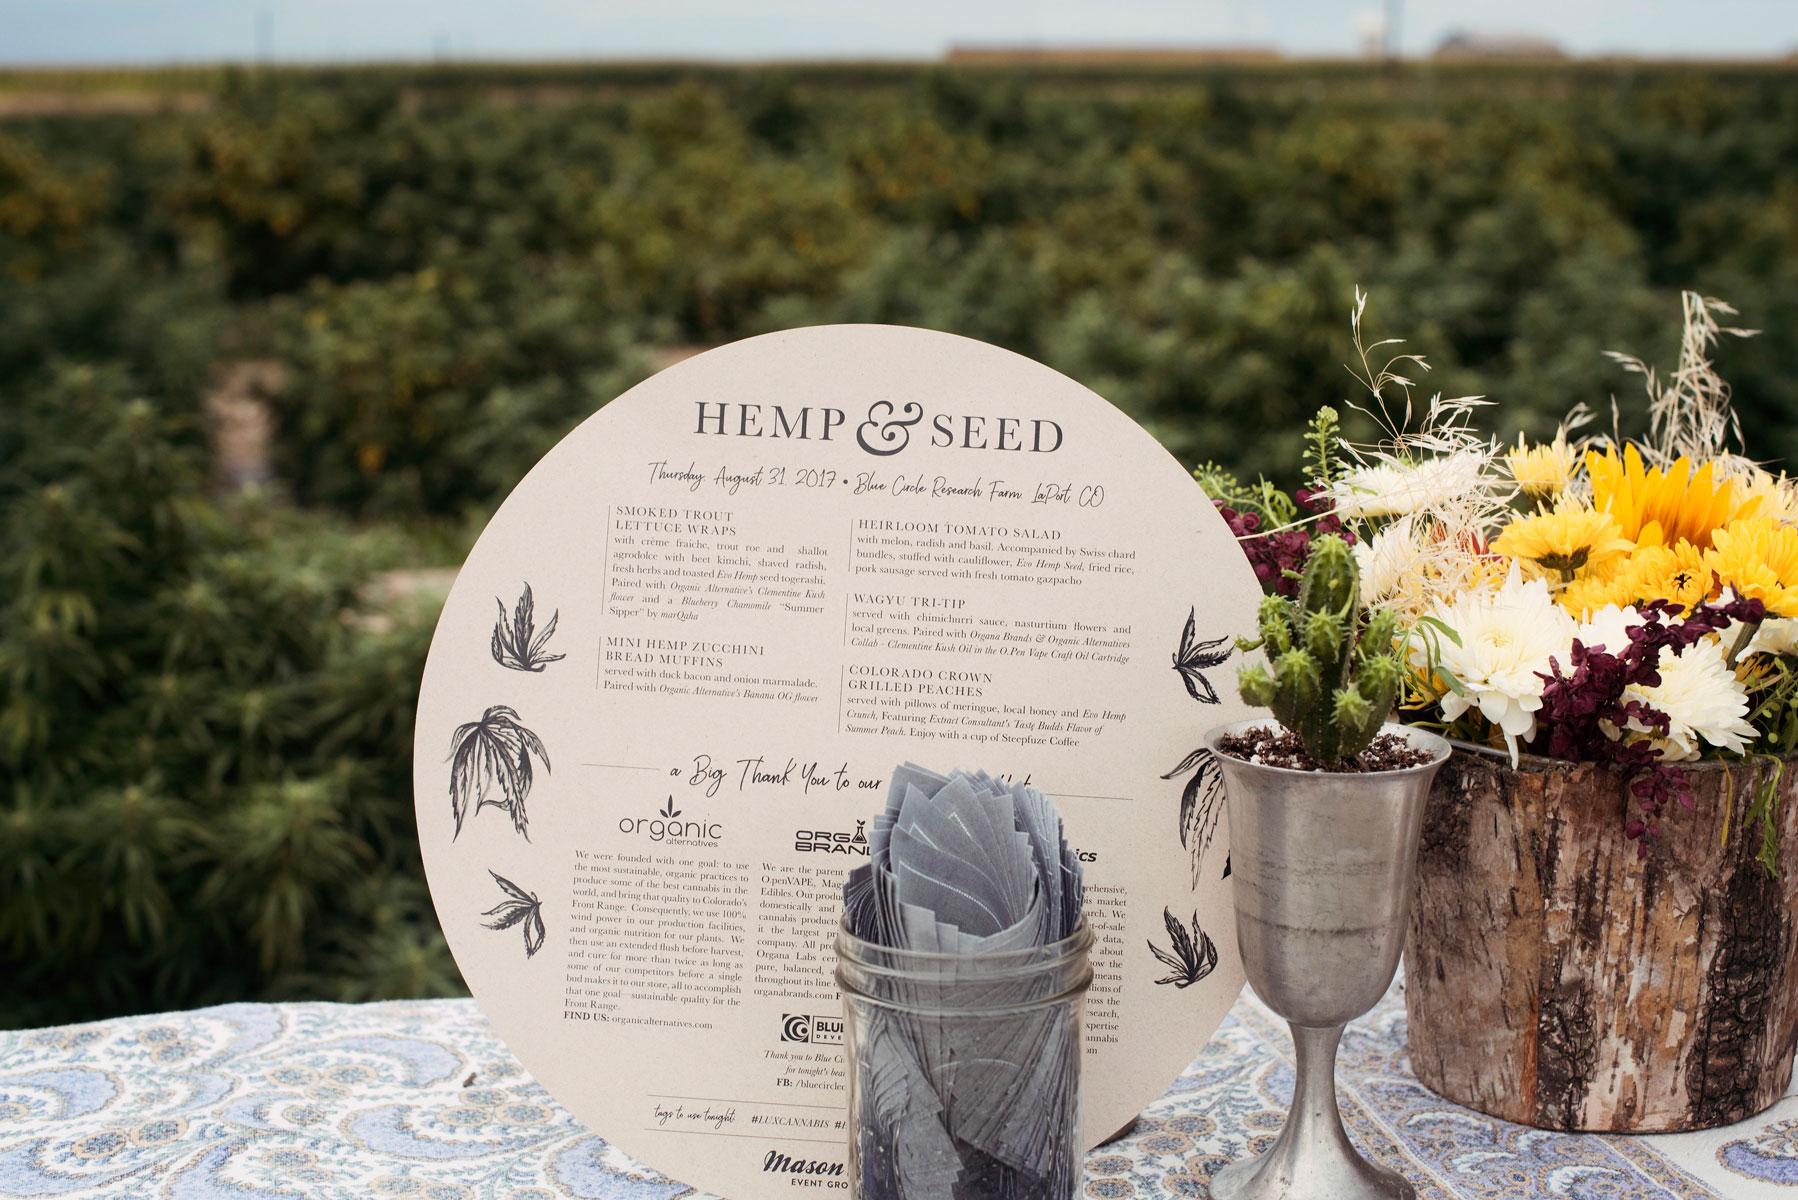 Menu Design by Kristen Williams, graphics courtesy of  Hempsley  /Image by  Dog Daze Photo, courtesy of  Mason Jar Event Group